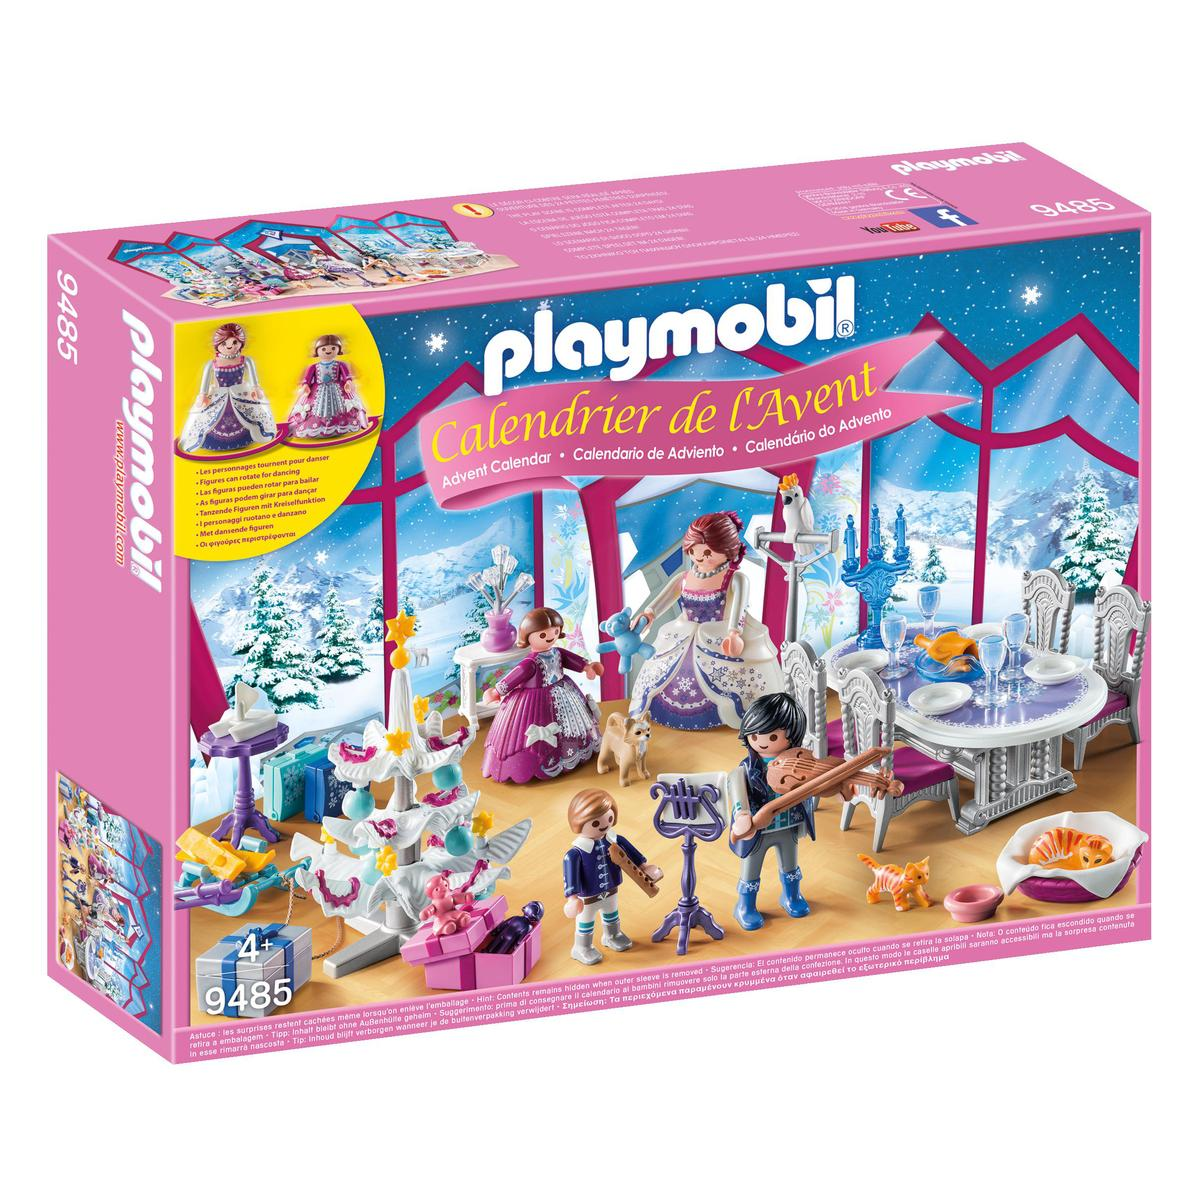 Playmobil Calendrier.Playmobil Christmas Calendrier De L Avent Bal De Noel Salon De Cristal 9485